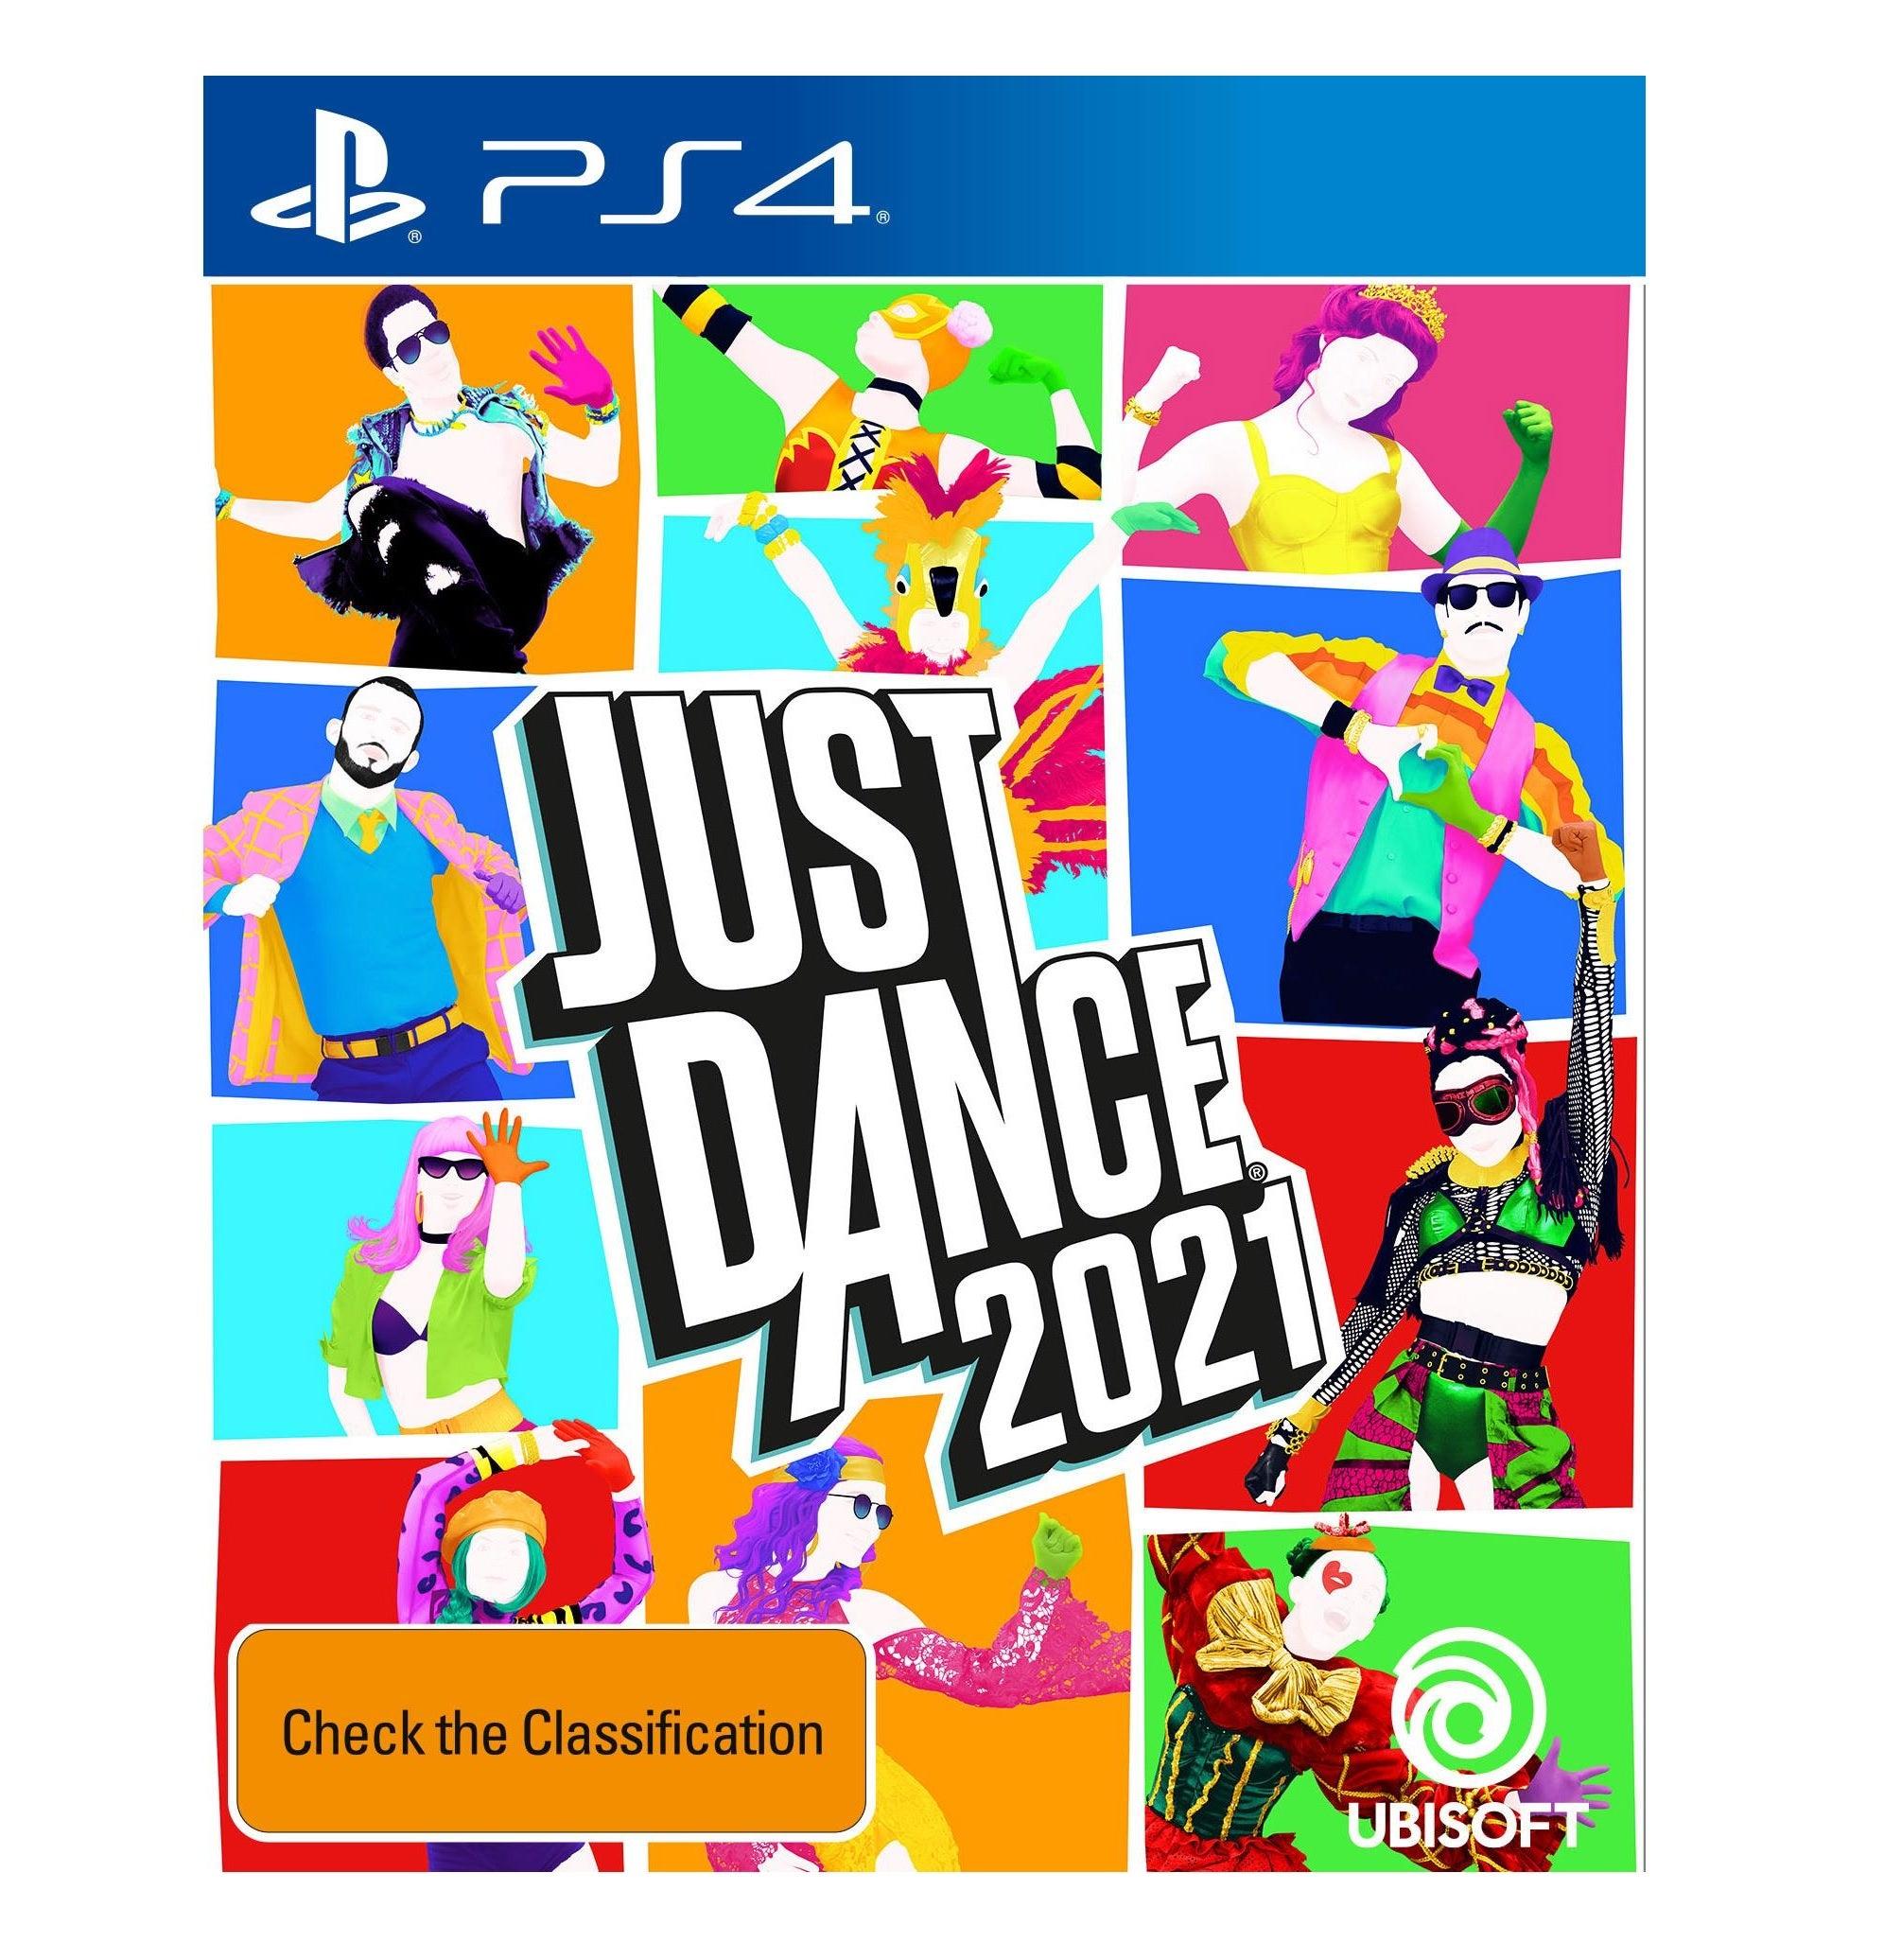 Ubisoft Just Dance 2021 PS4 Playstation 4 Game